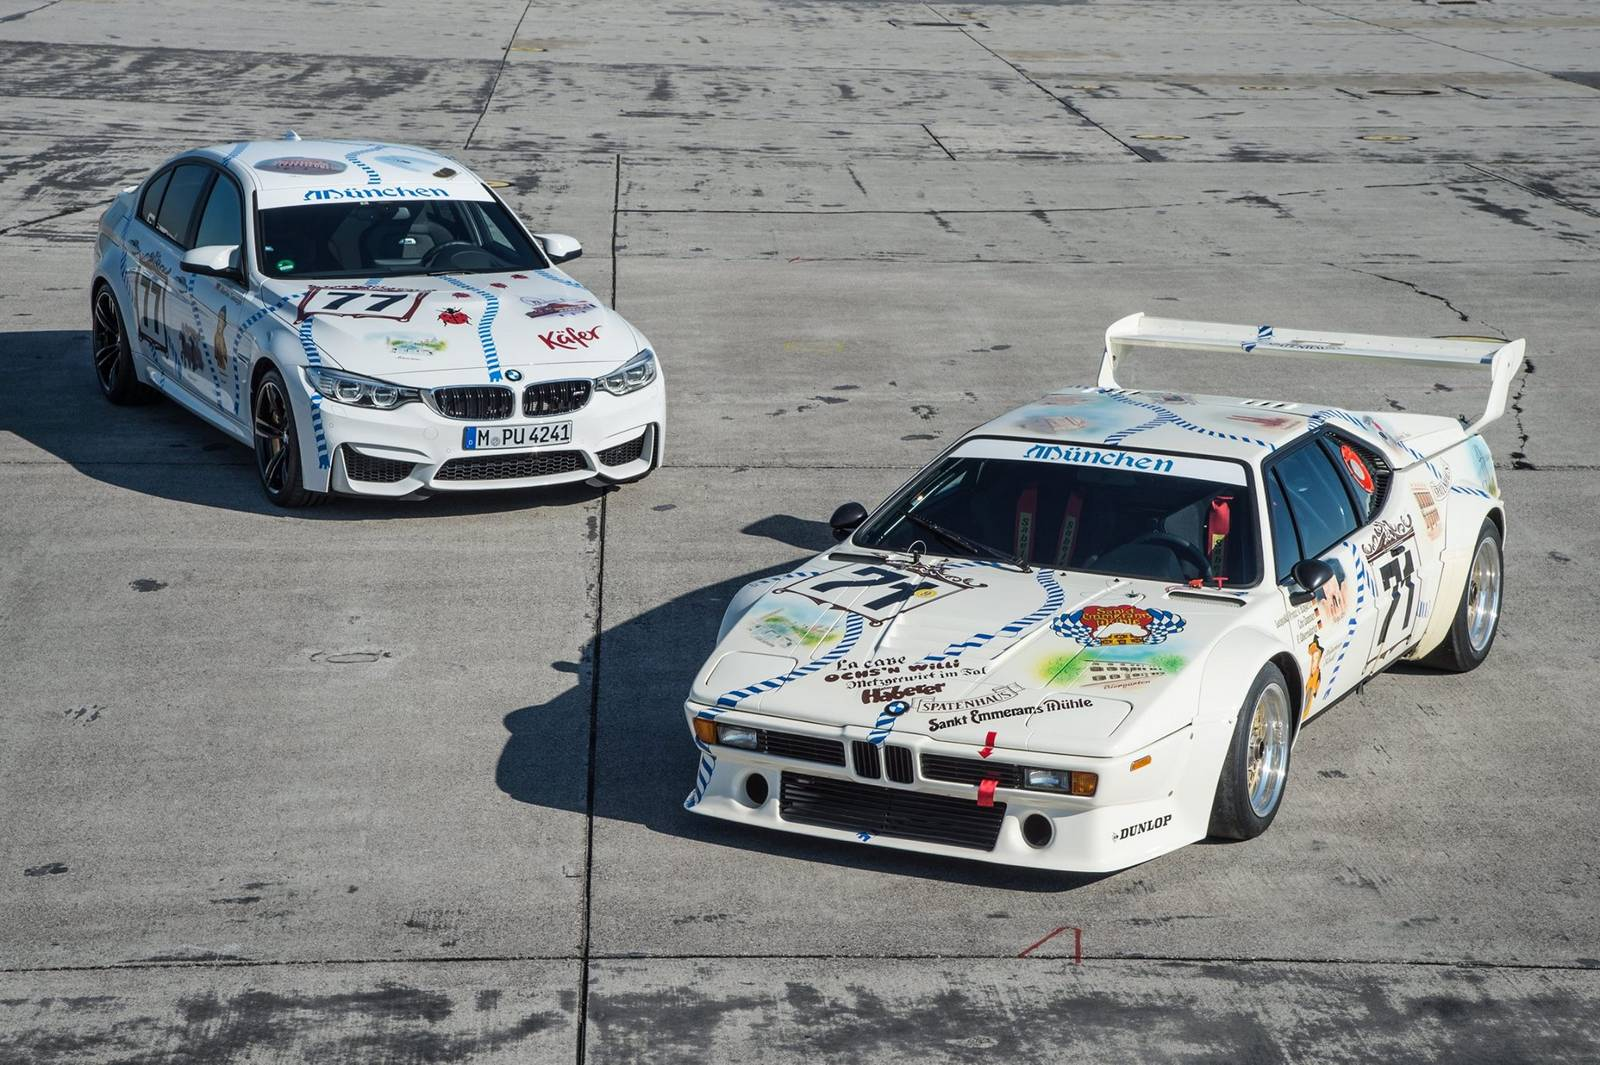 BMW M3 Meets Legendary BMW M1 at Oktoberfest - GTspirit